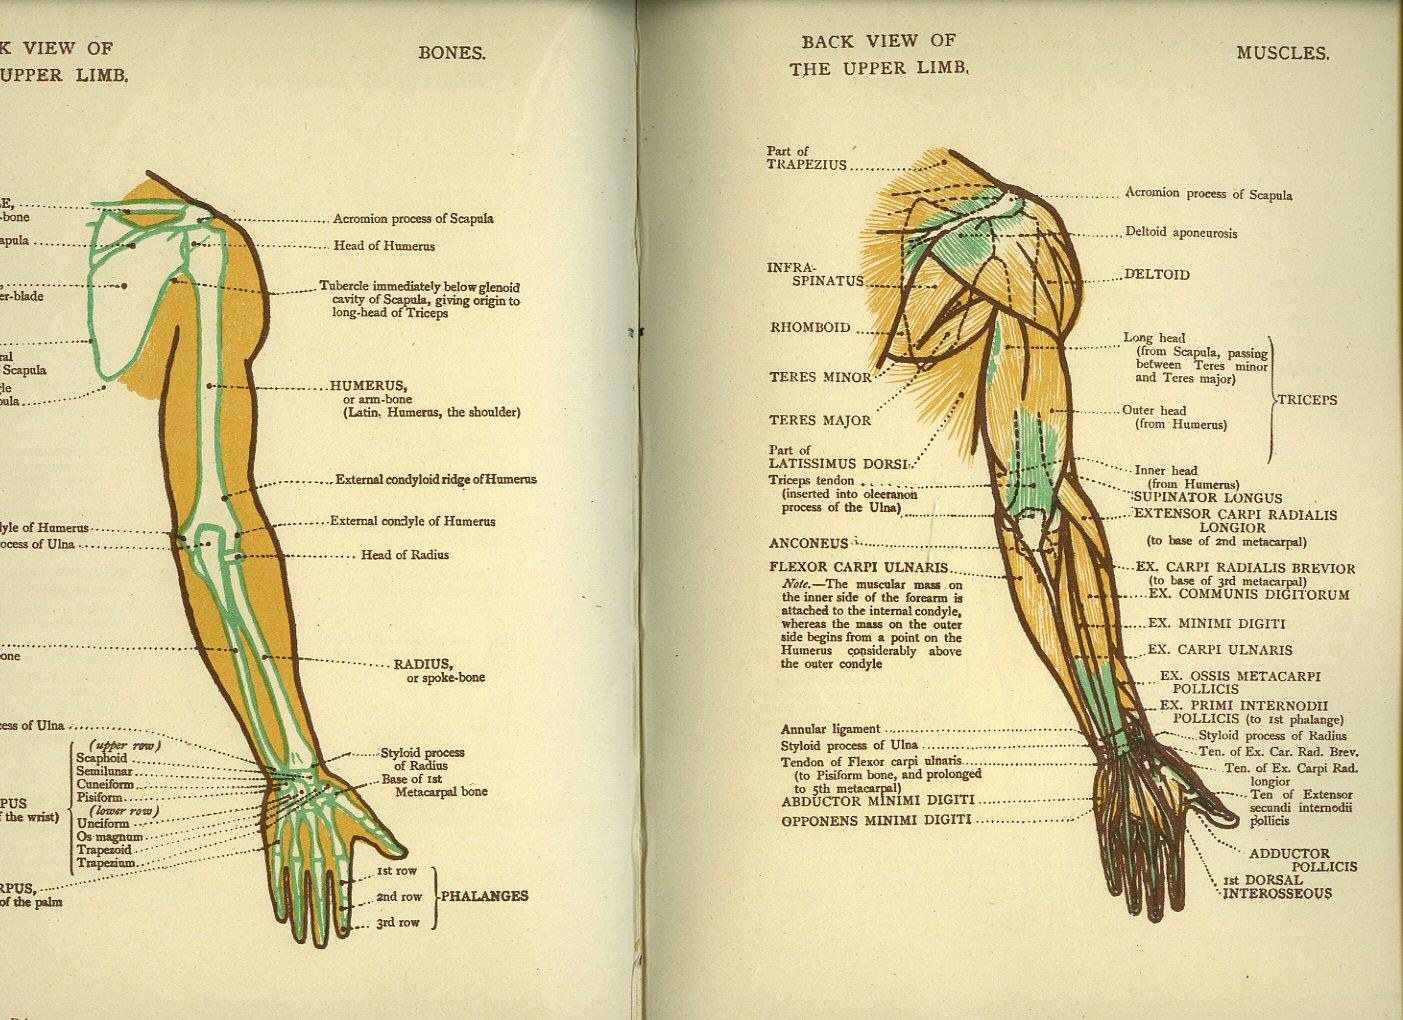 Anatomy of upper limb bones